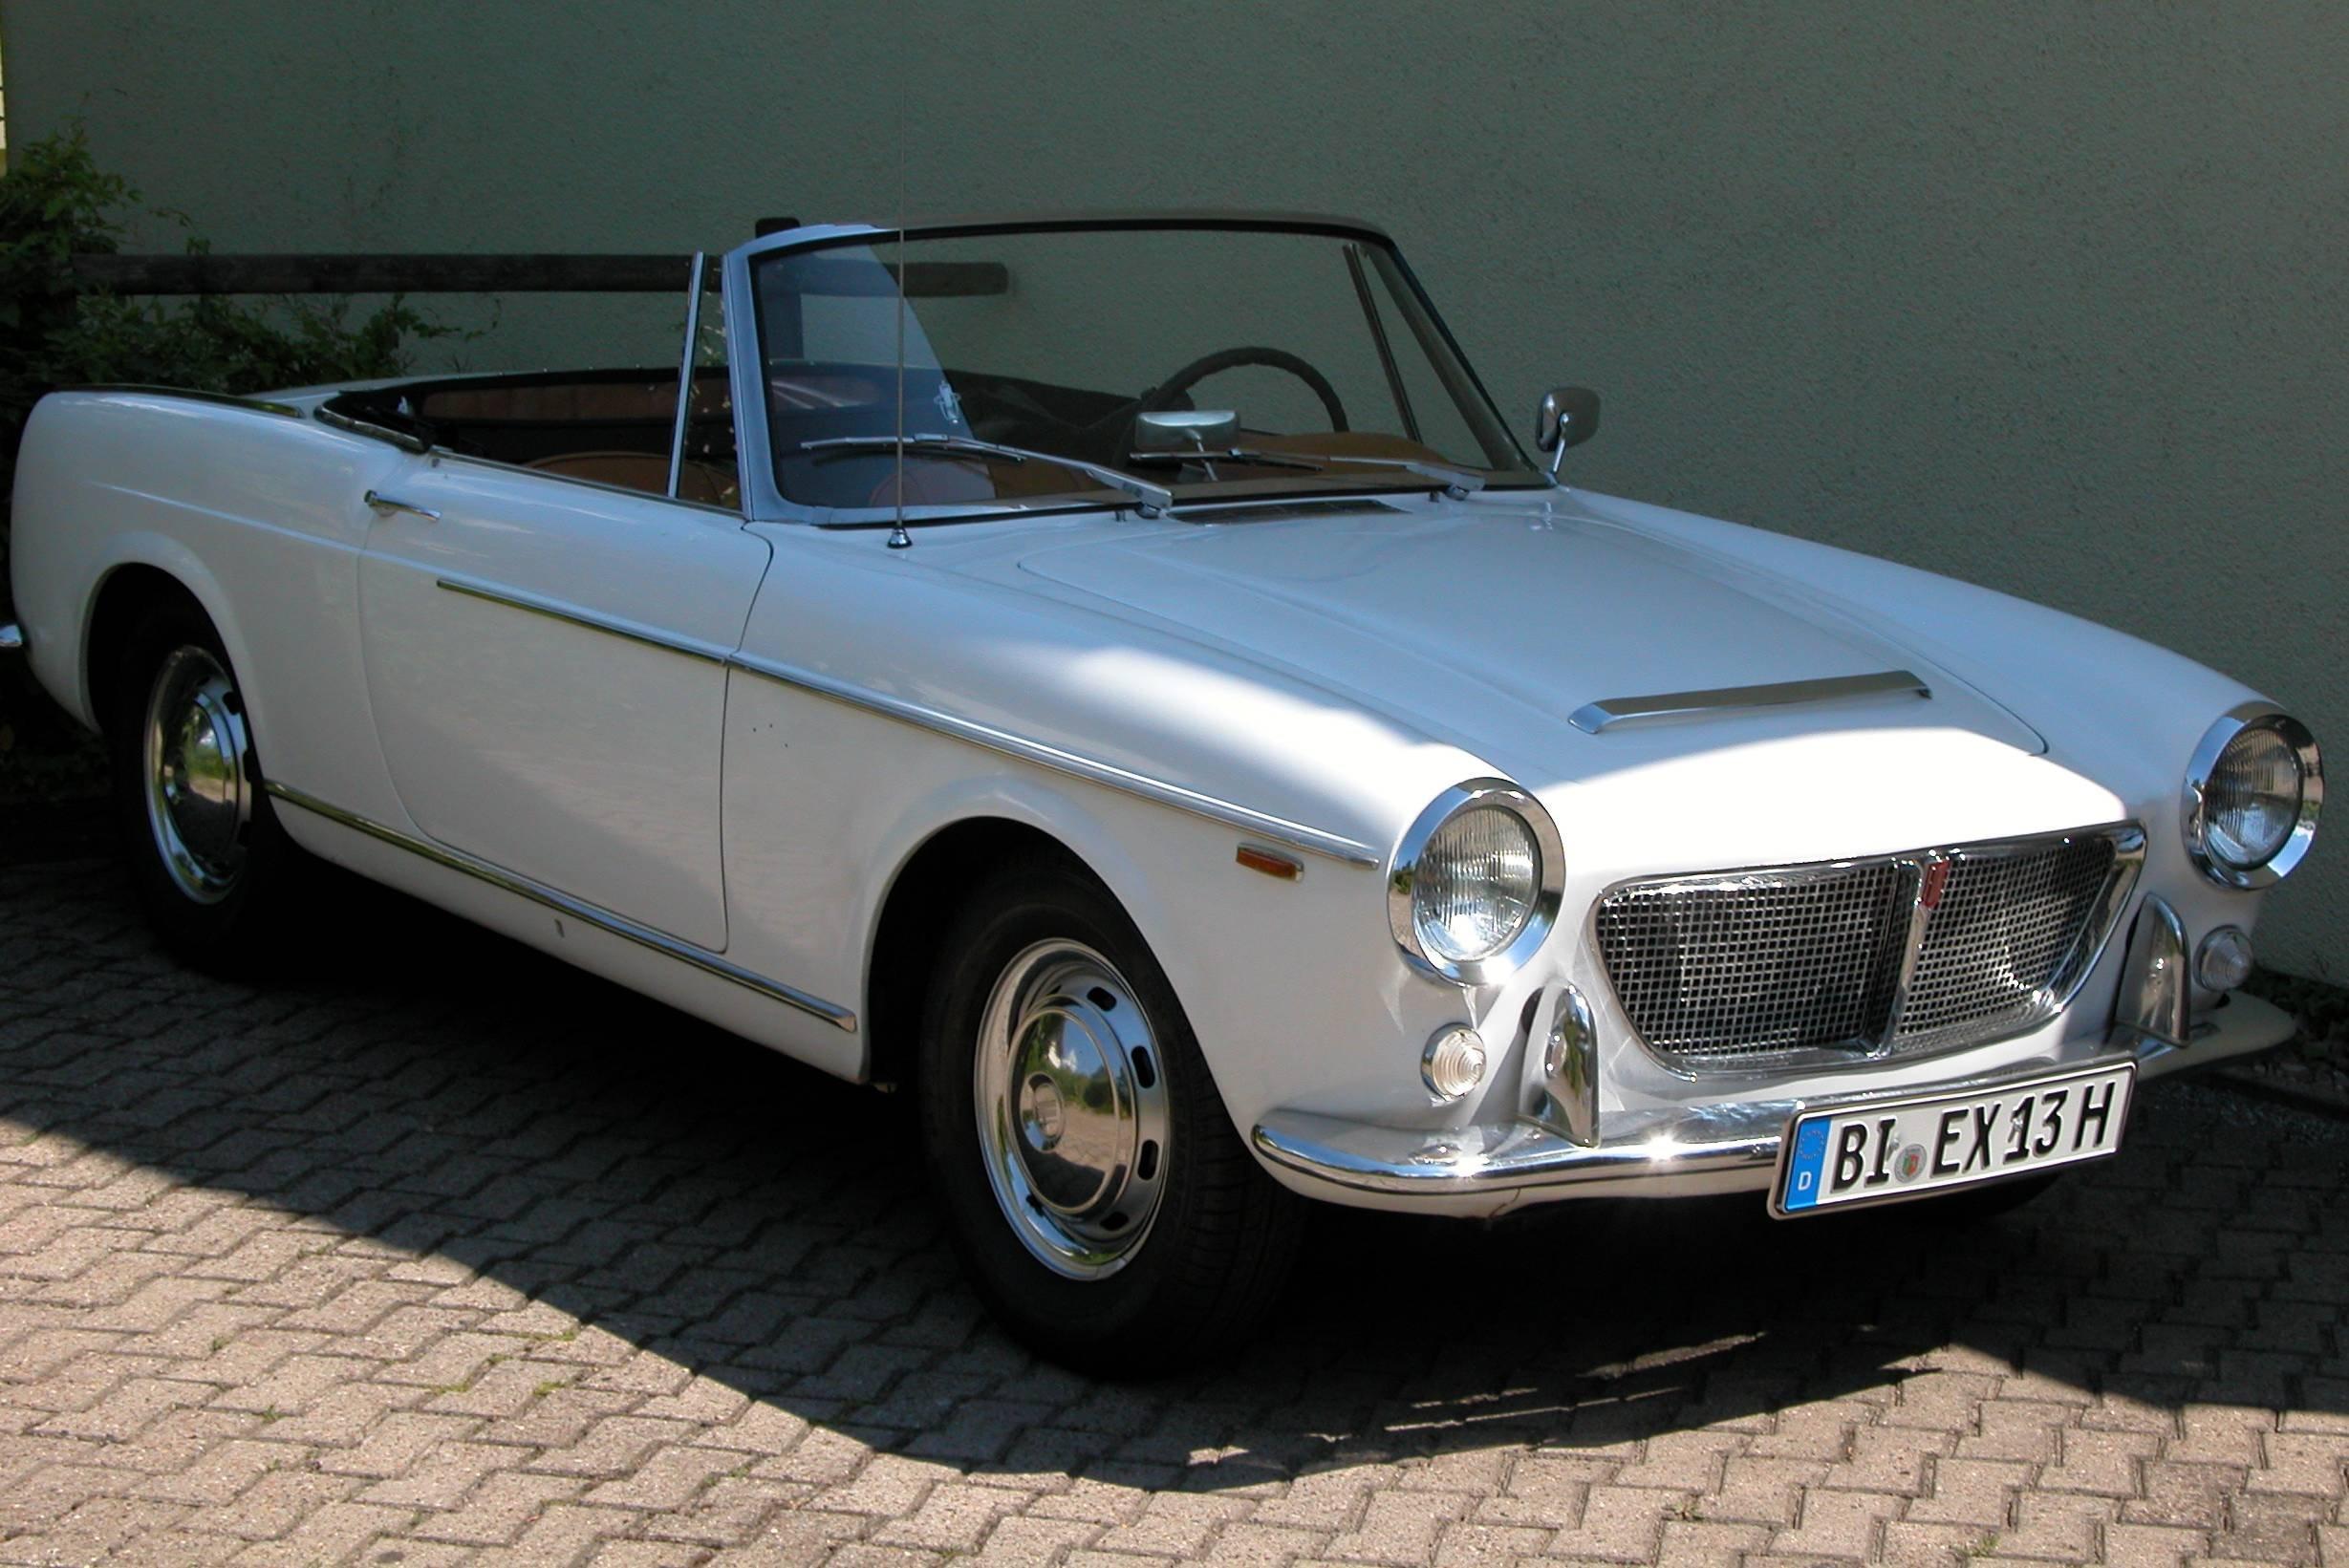 1200 cars classic fiat italia italie cabriolet convertible wallpaper 451755. Black Bedroom Furniture Sets. Home Design Ideas